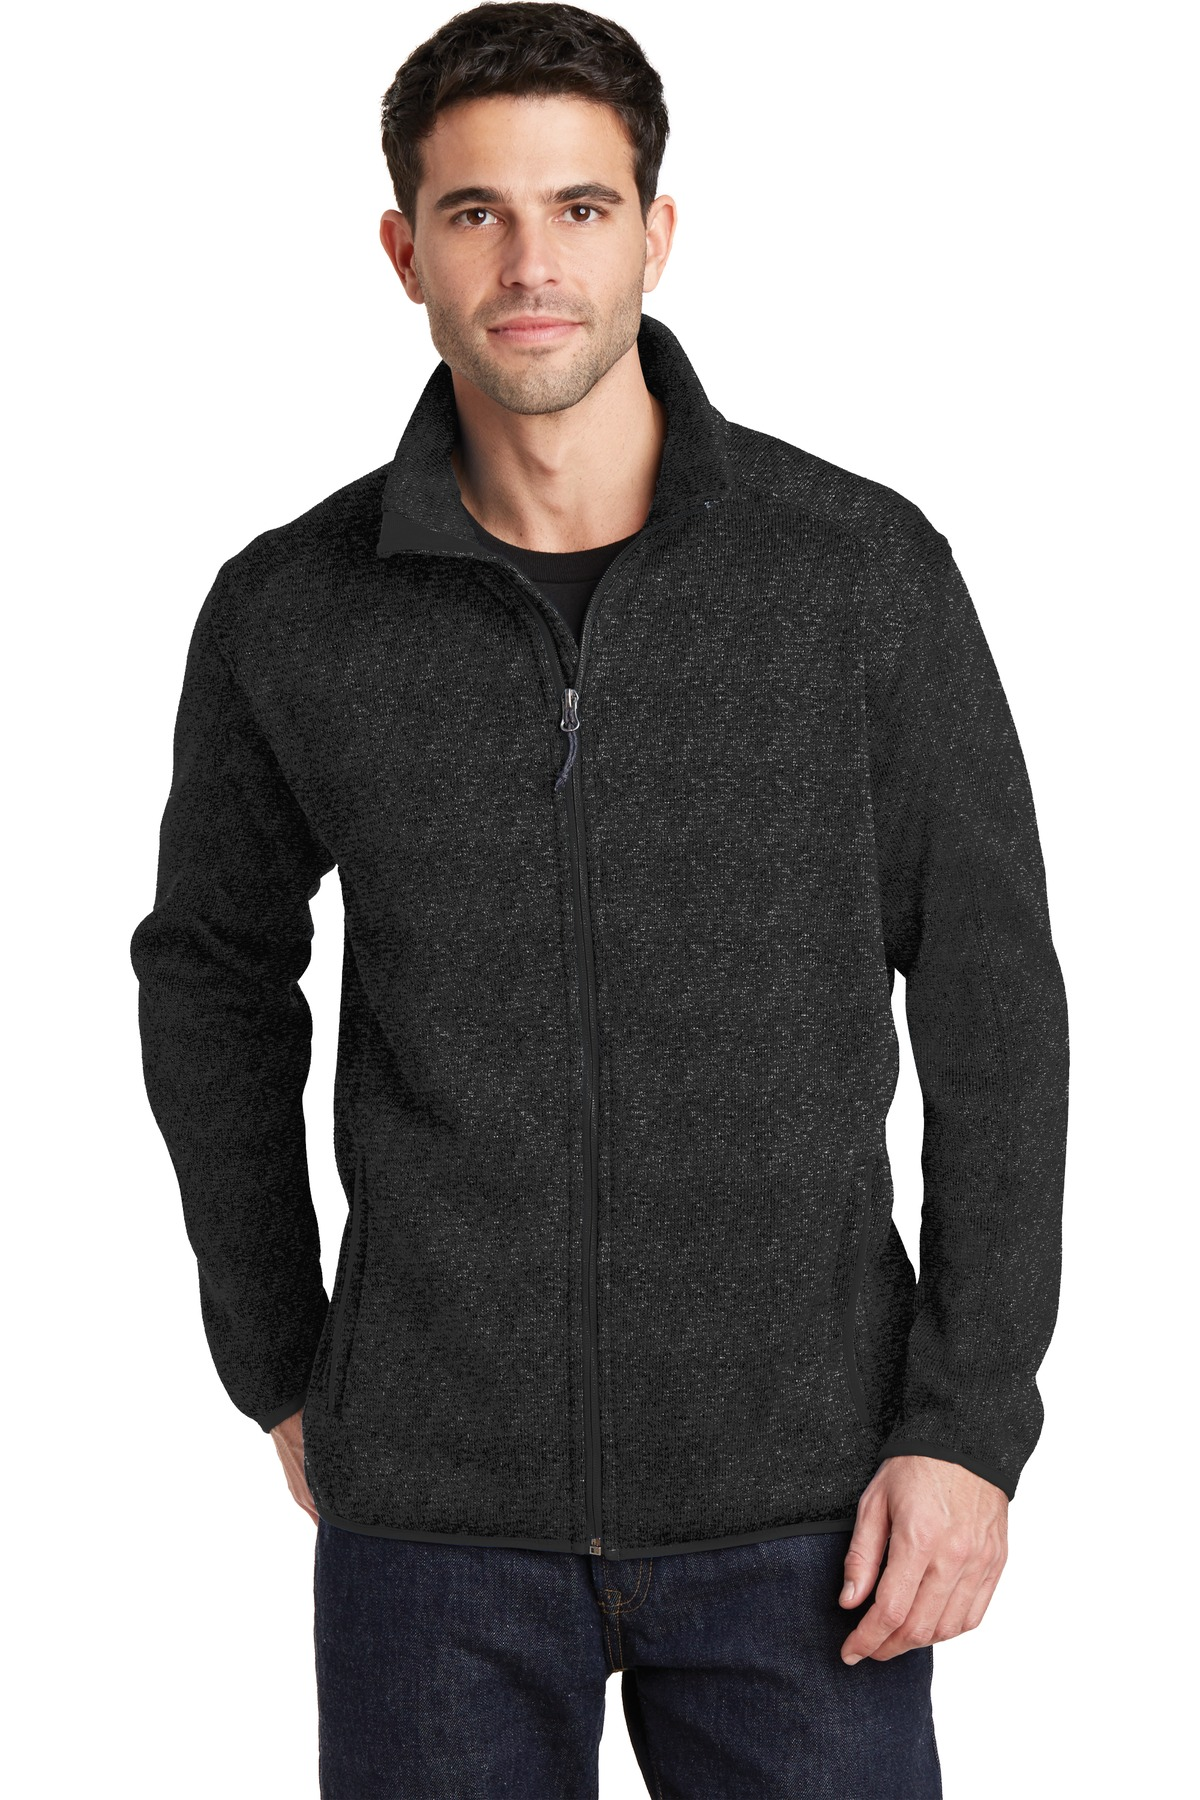 Port Authority  F232 - Sweater Fleece Jacket